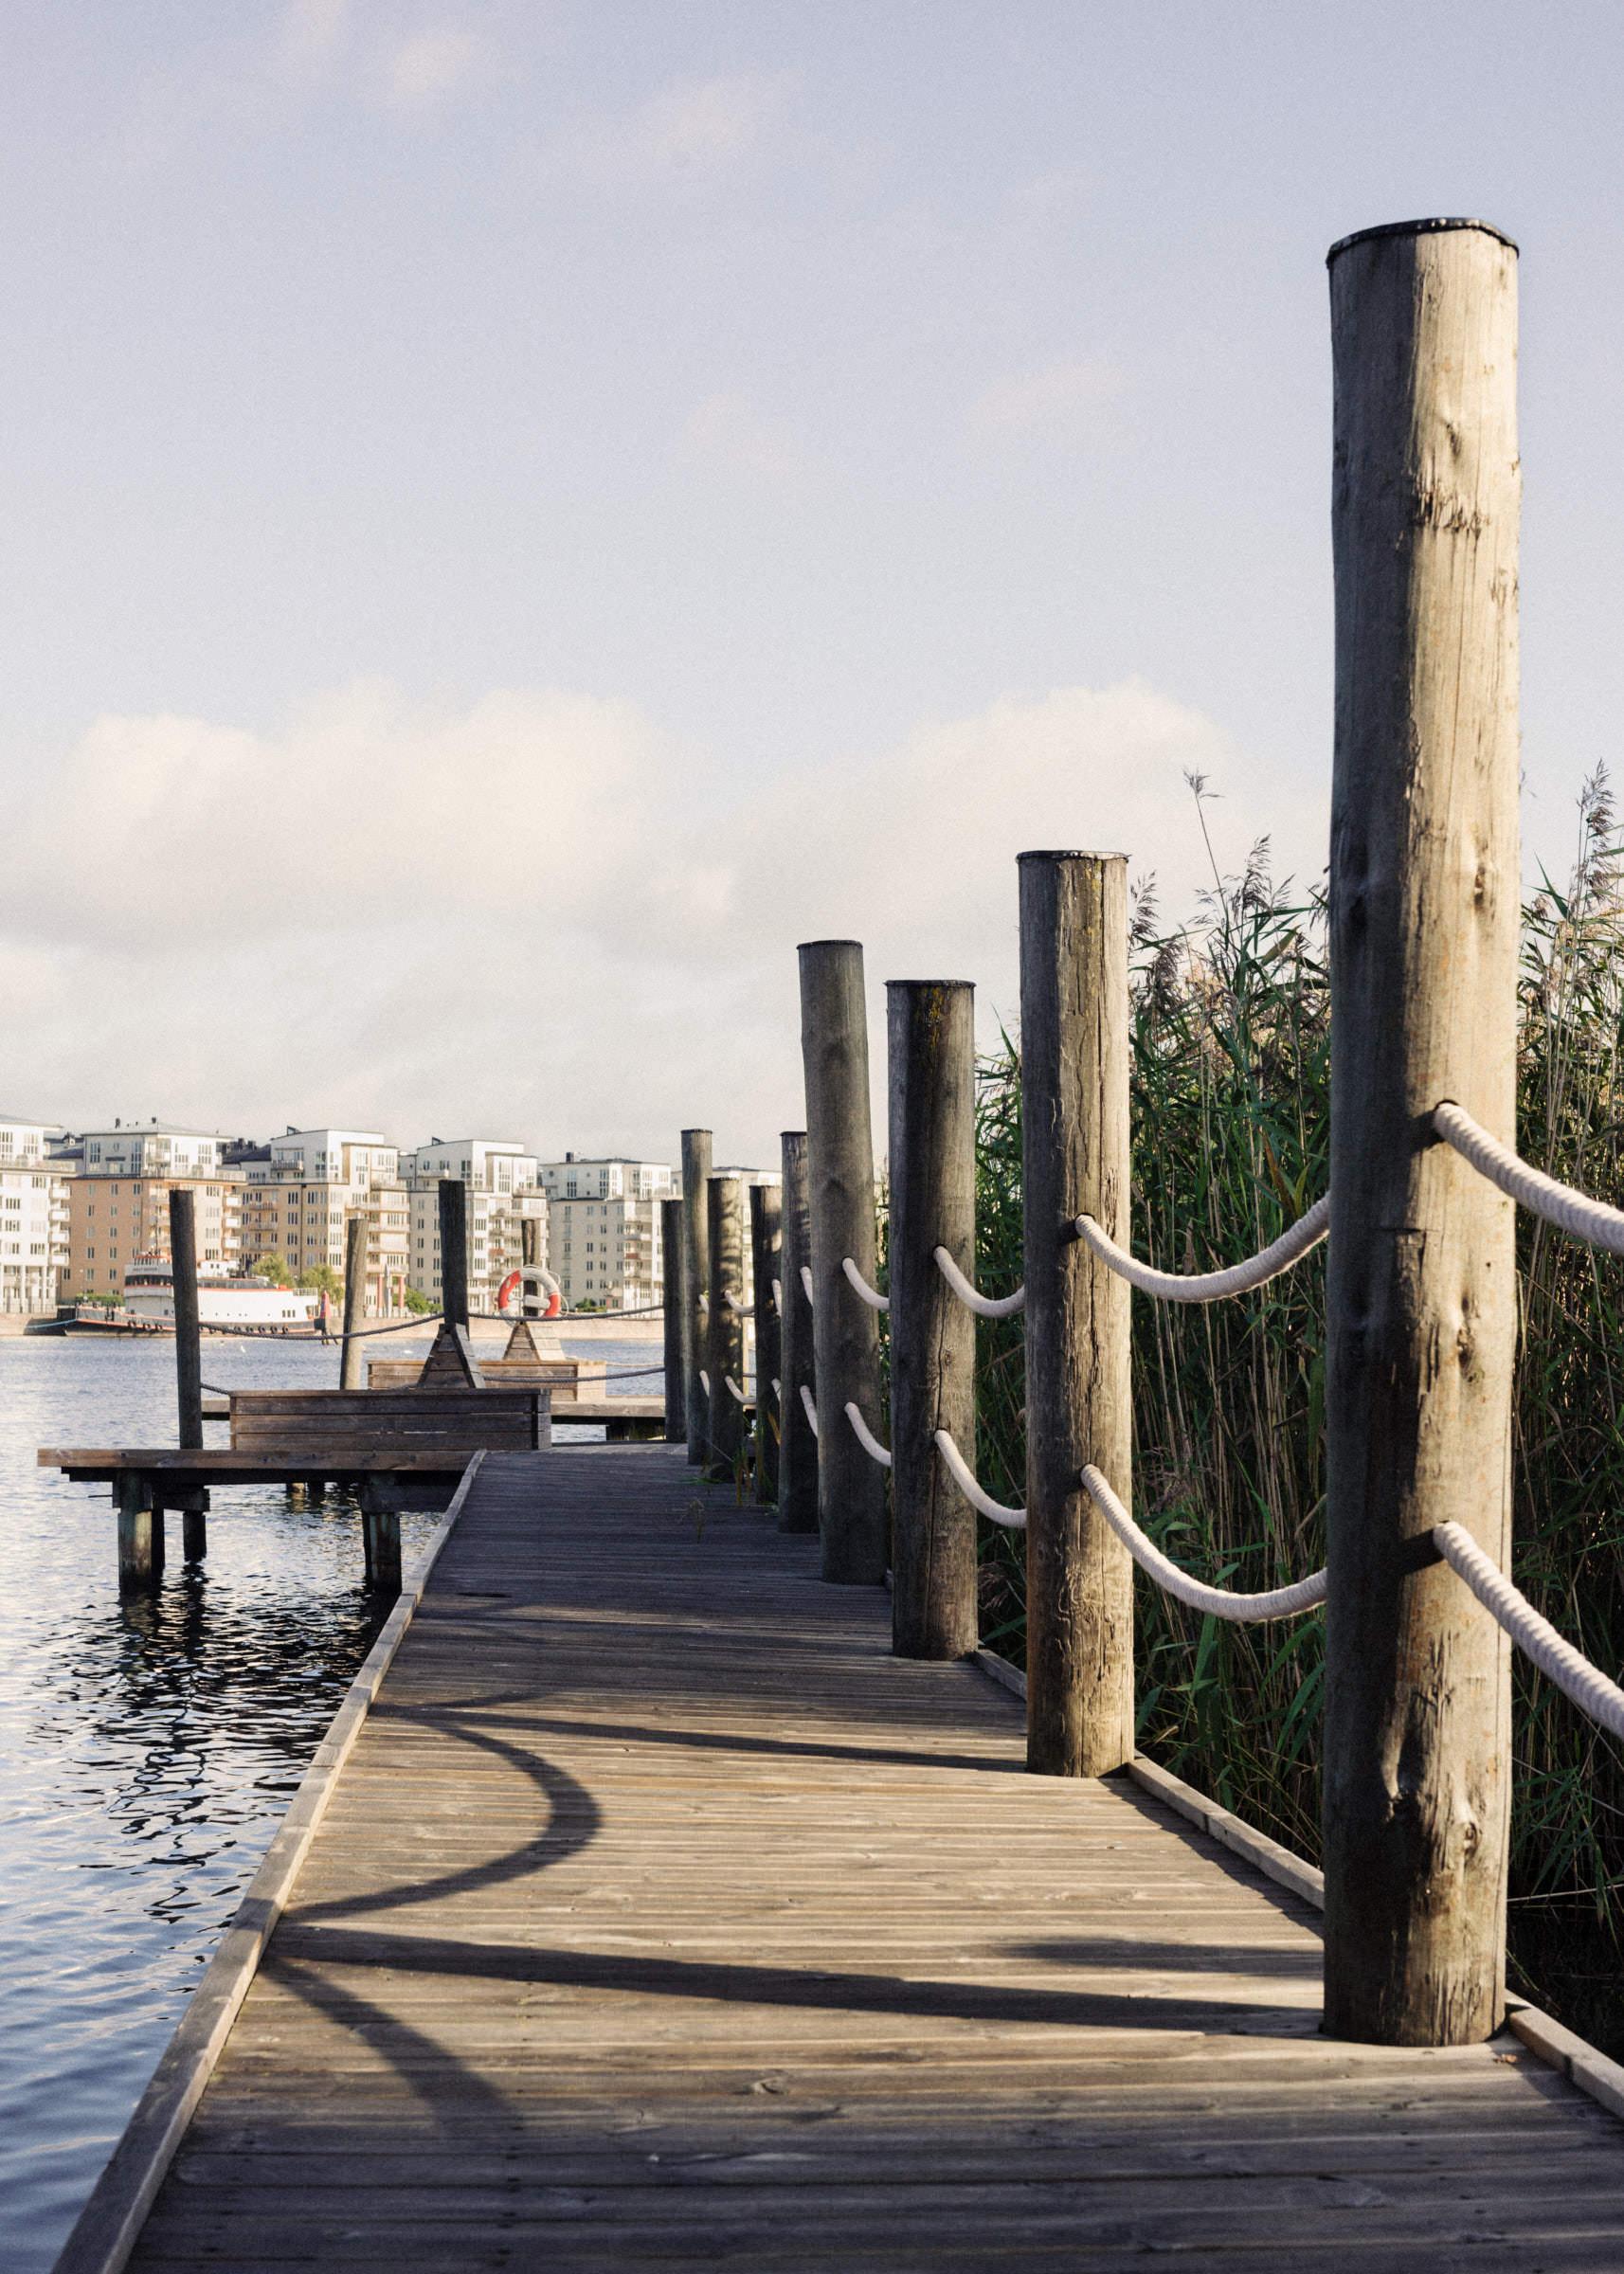 Portfolio_439_Urban Landscape ICA Sverige 2014_3_KRISTOFER SAMUELSSON PHOTOGRAPHY.jpg